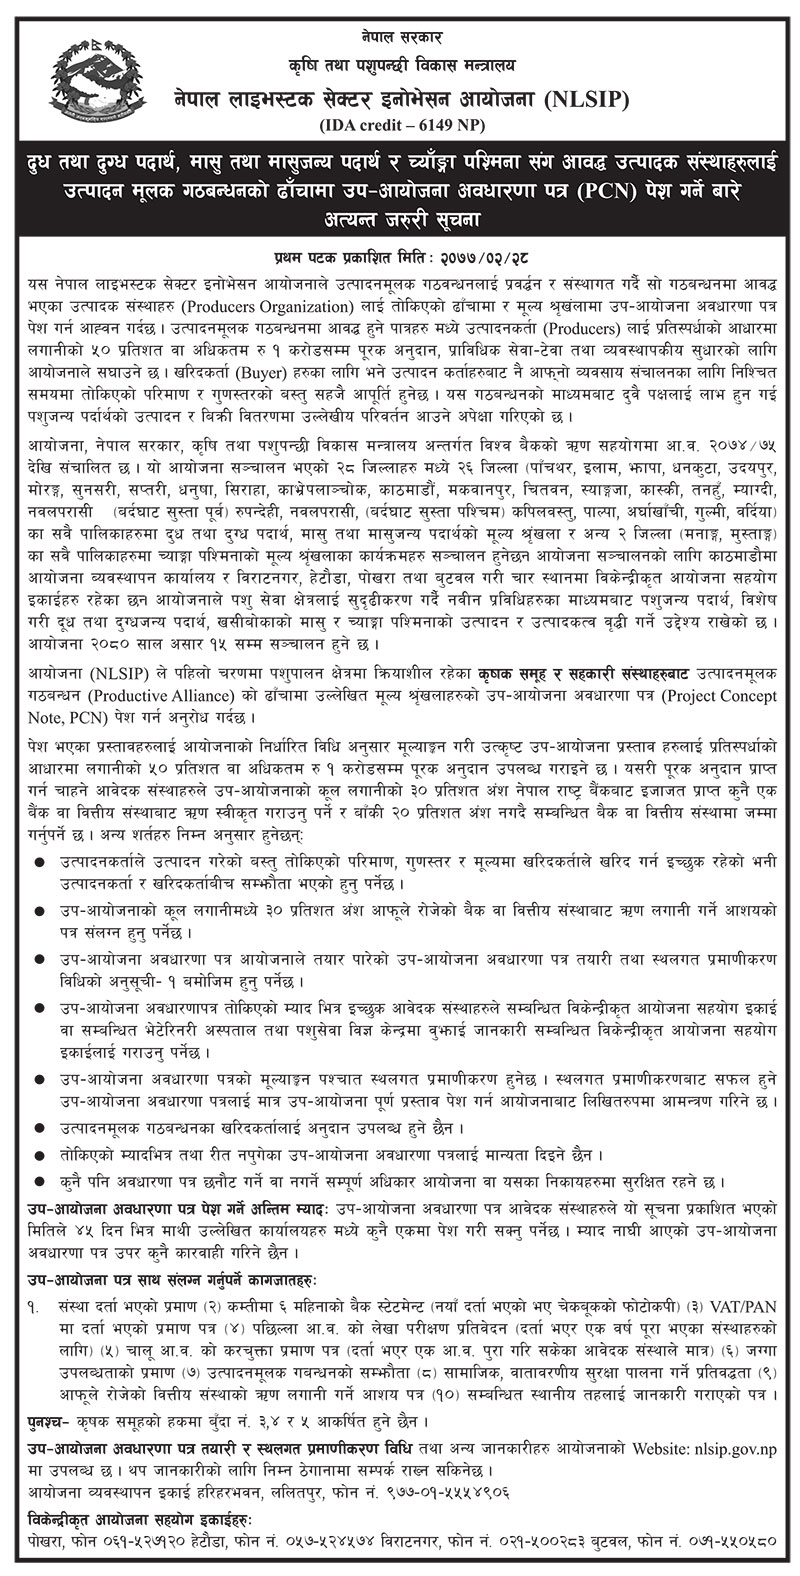 नेपाल लाइभस्टक सेक्टर इनोभेसन प्रोजेक्ट (NLSIP)